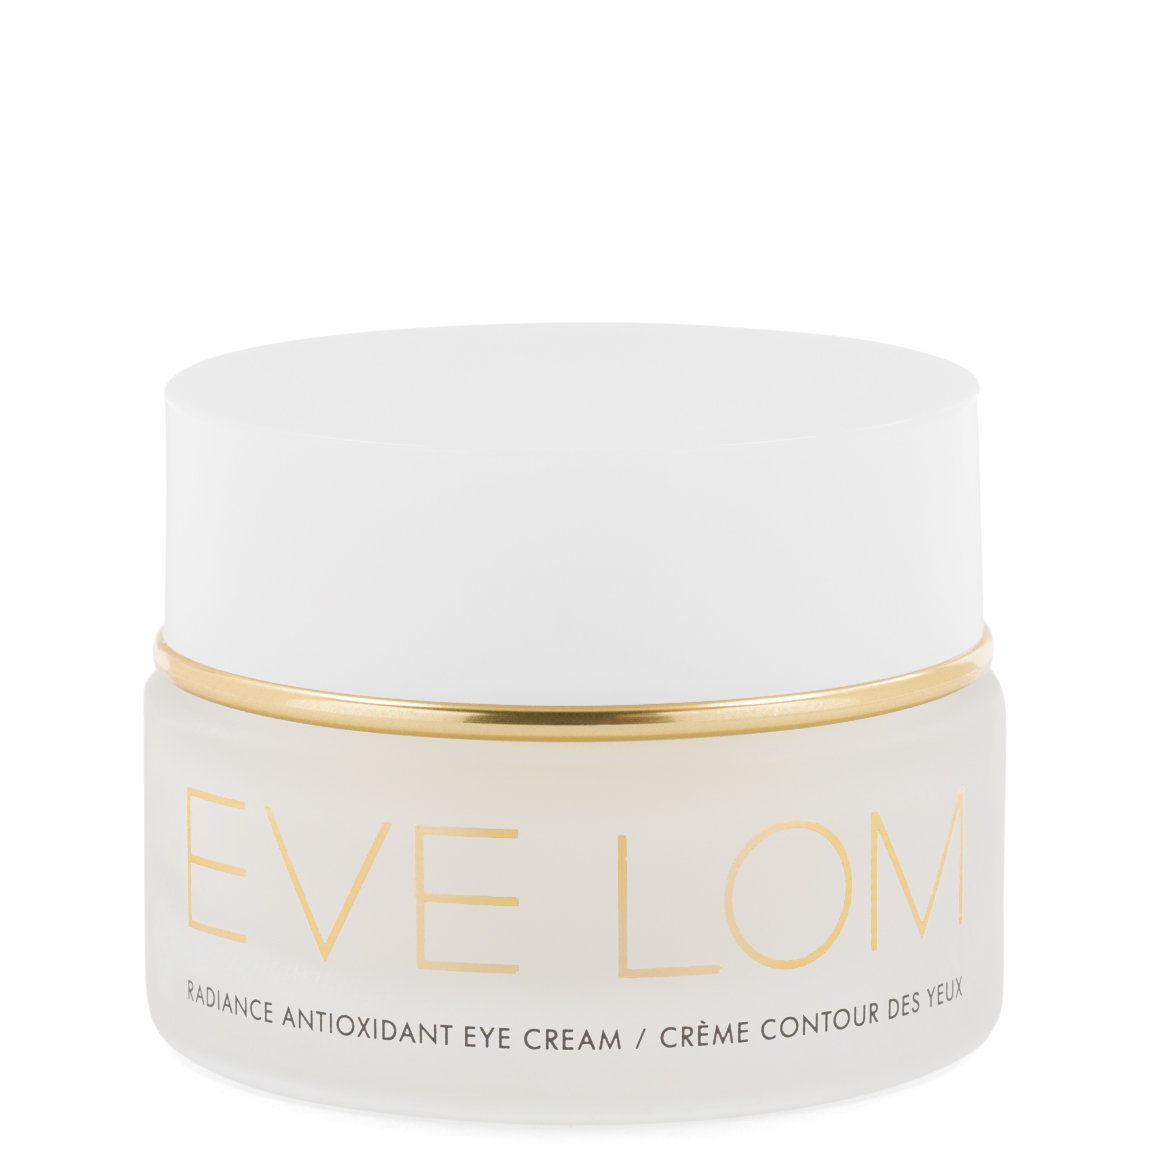 EVE LOM Radiance Antioxidant Eye Cream alternative view 1 - product swatch.